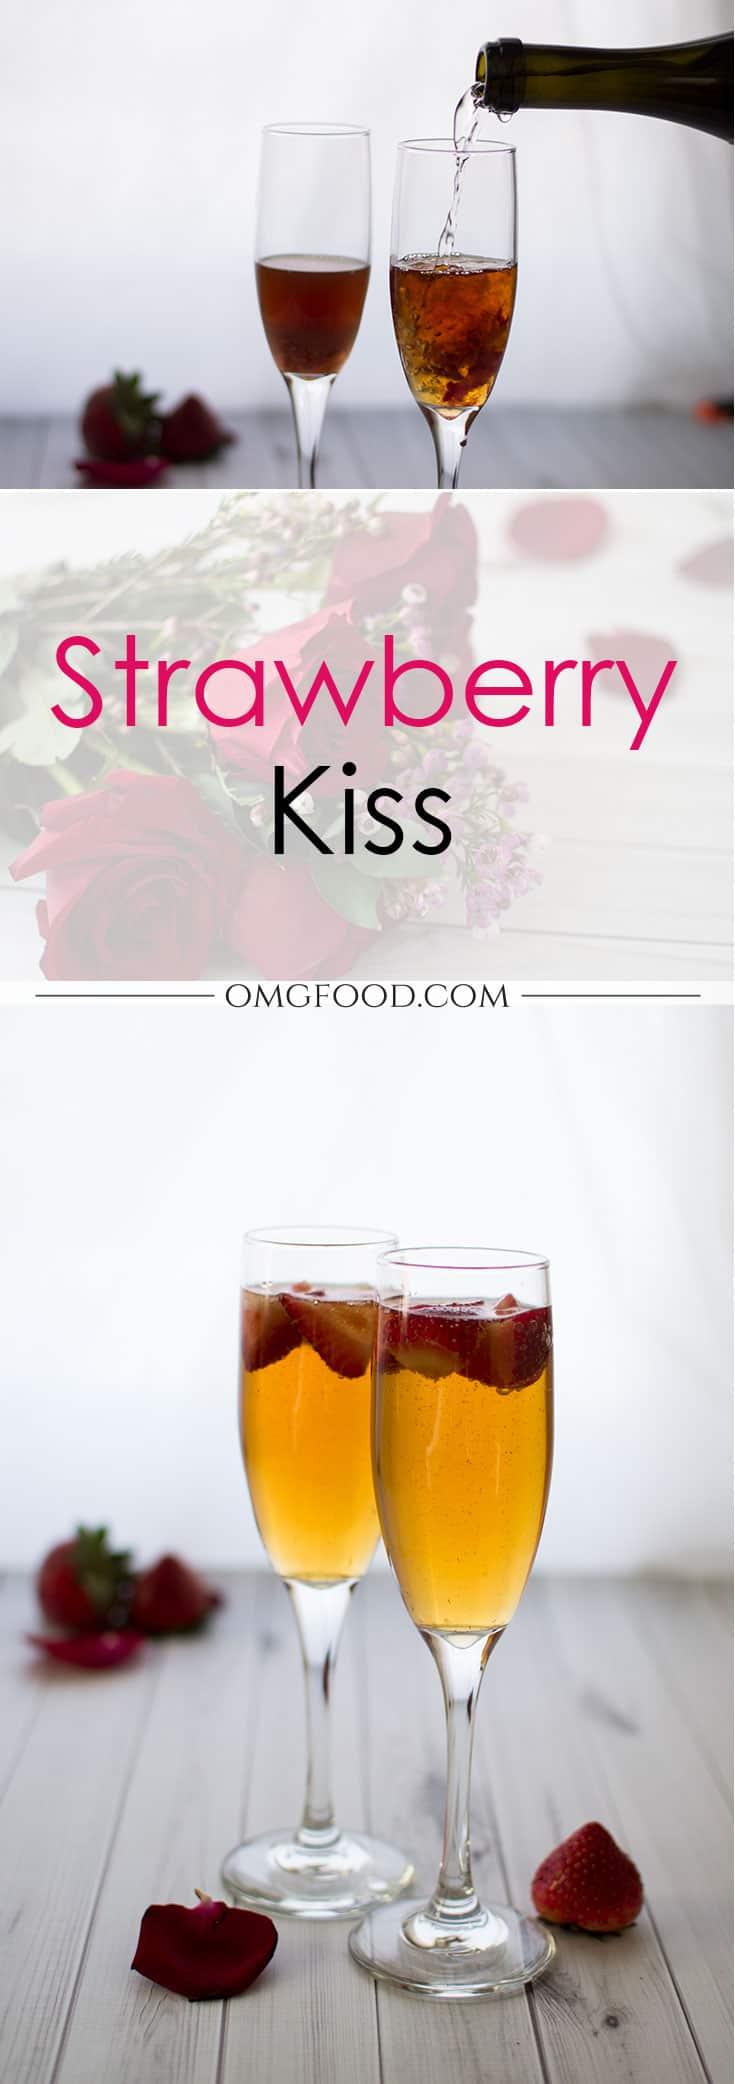 Pinterest banner for strawberry kiss cocktail.